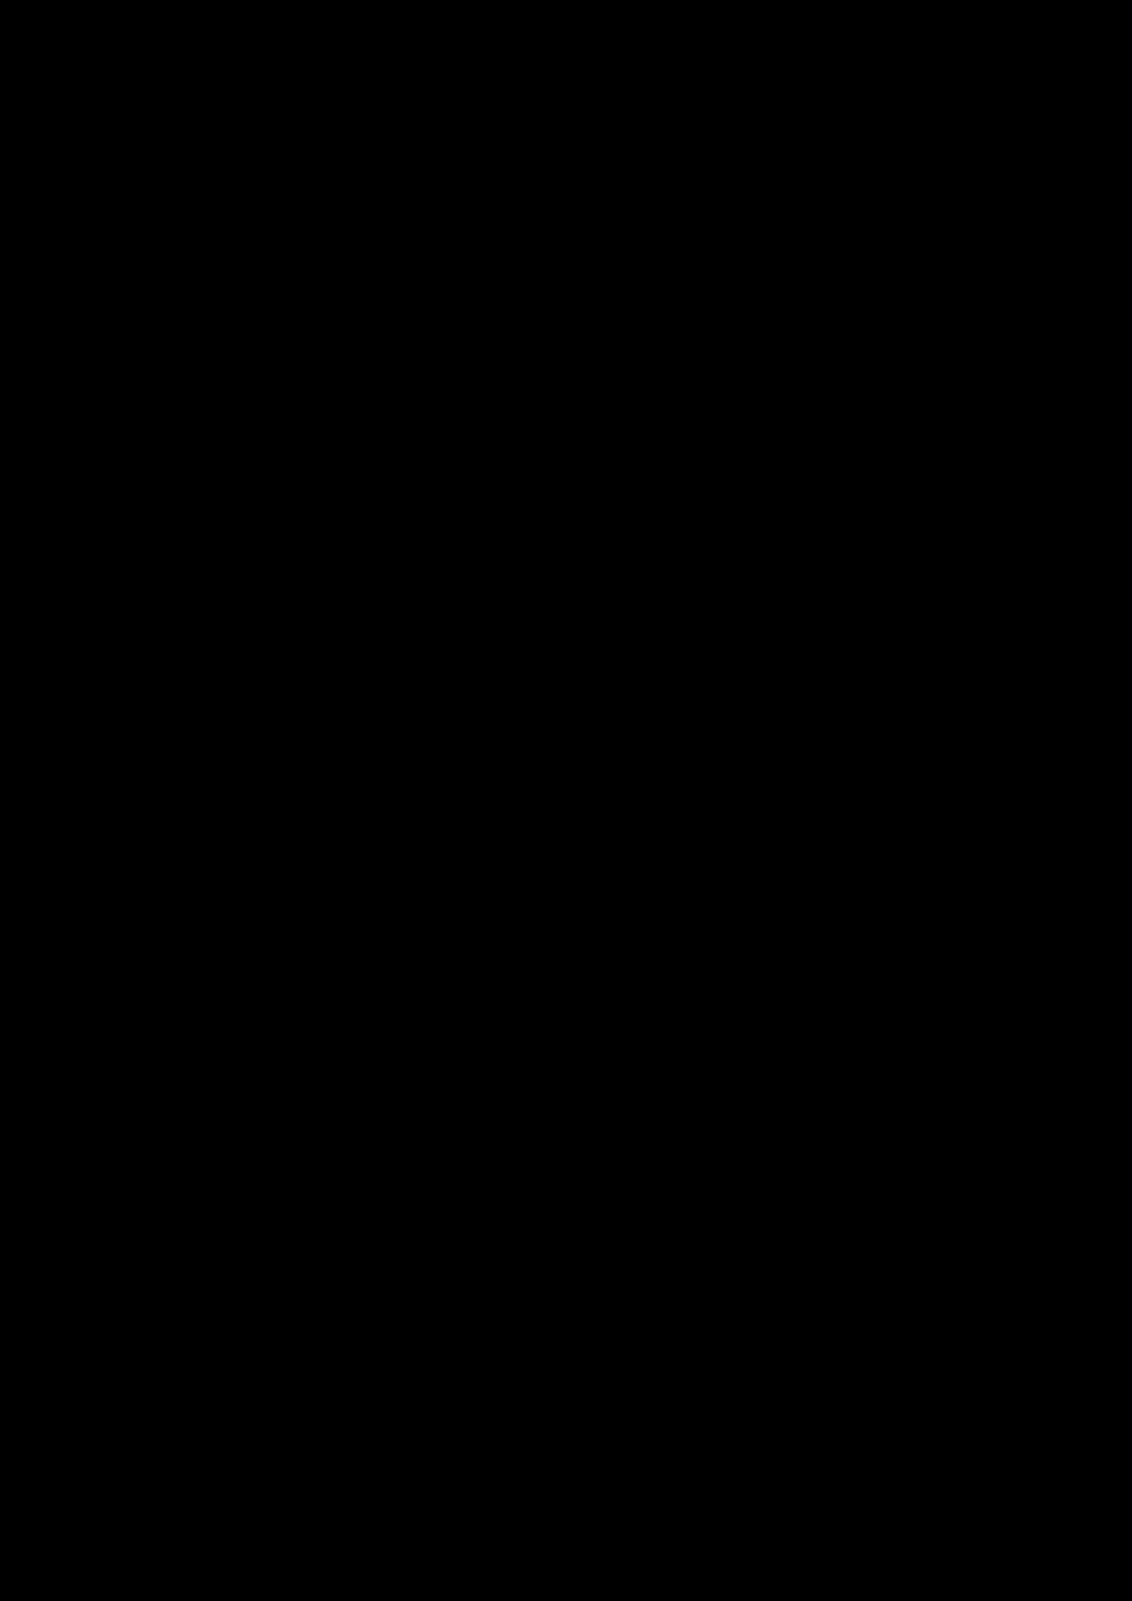 18 berez slide, Image 29